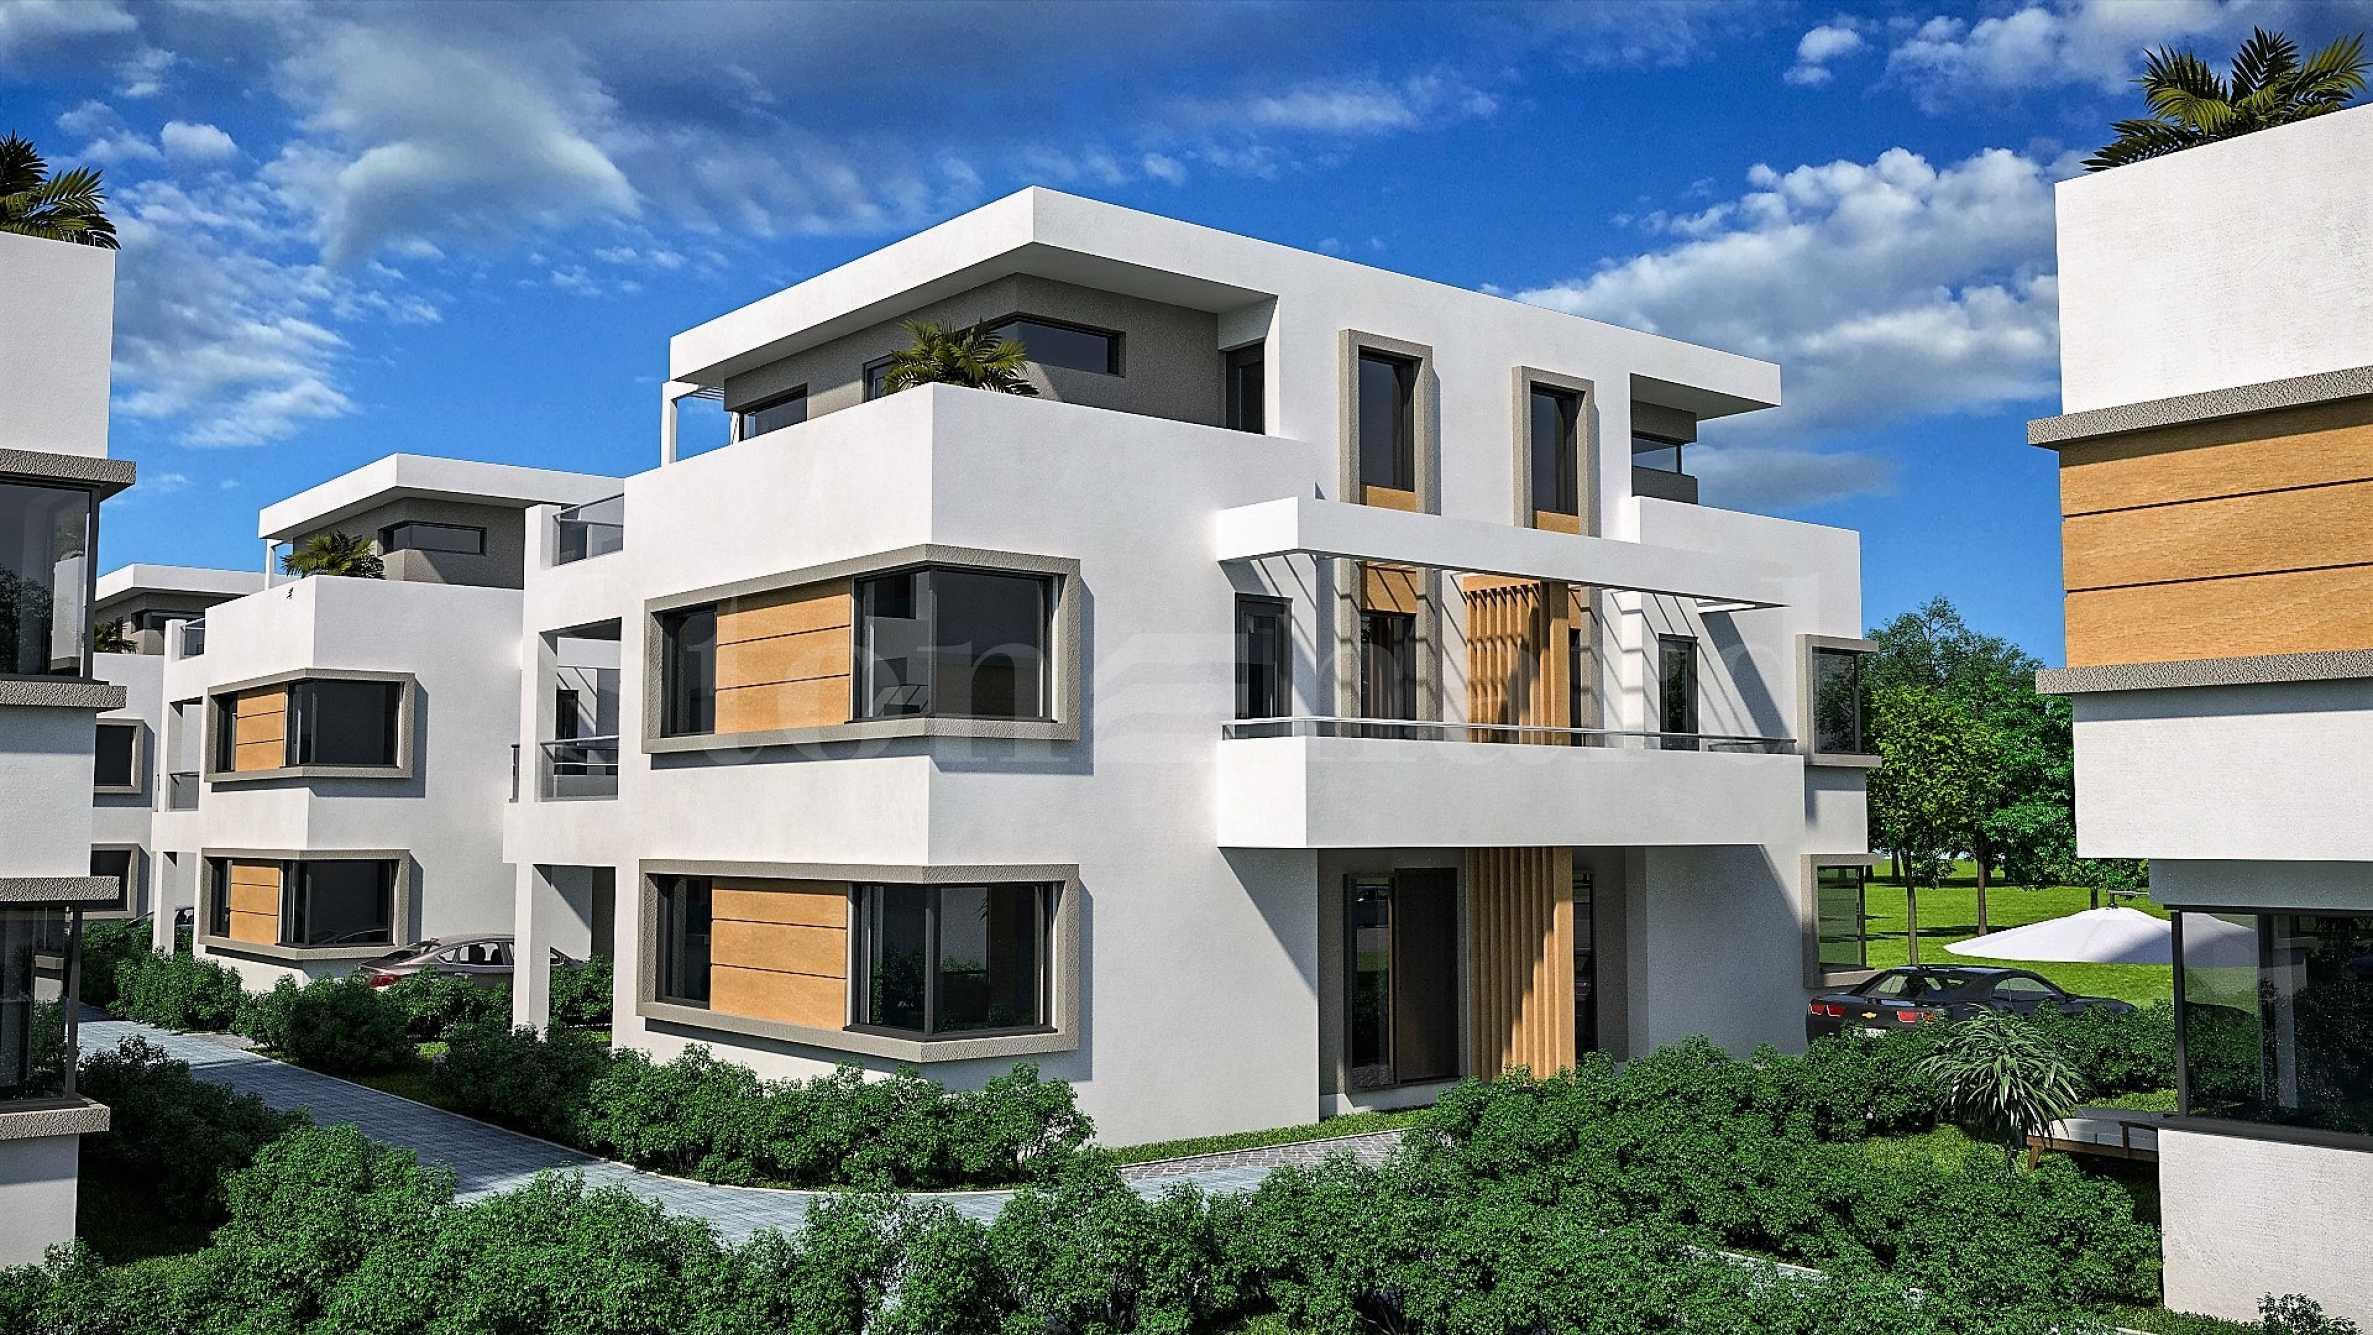 Modern houses in the seaside district of Sarafovo, Burgas2 - Stonehard